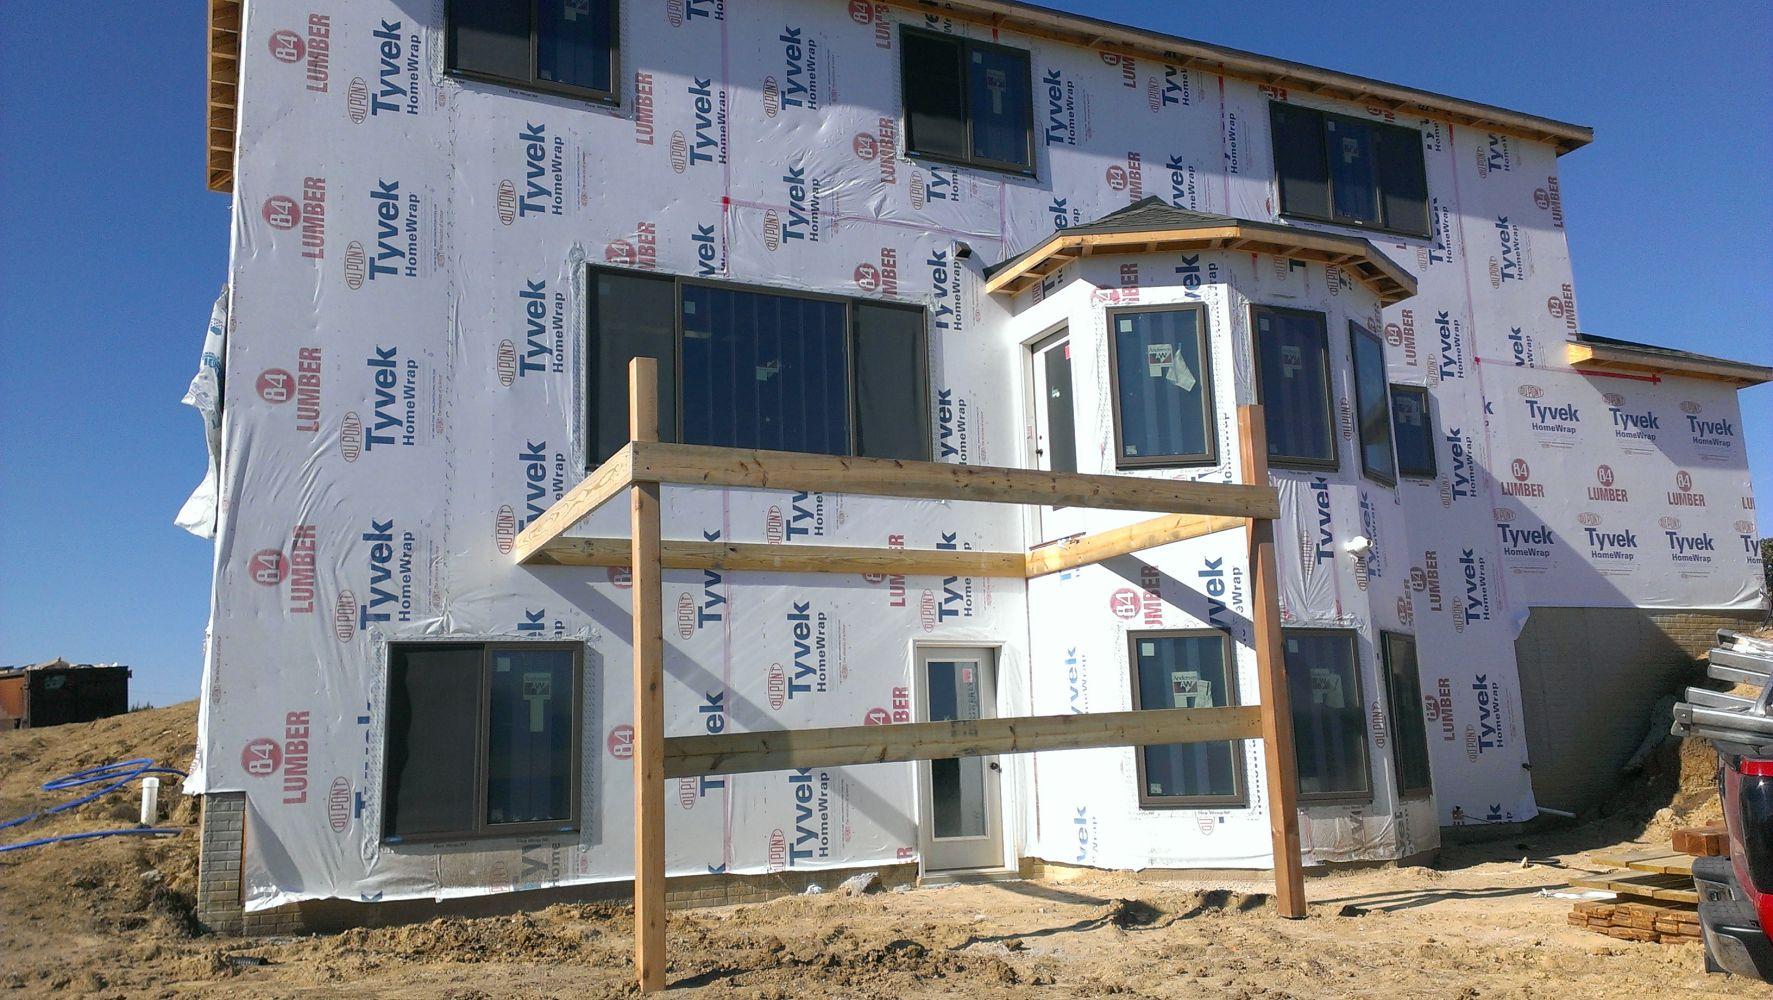 Lincoln ne home remodeling 28 images lincoln ne home for Pool design lincoln ne